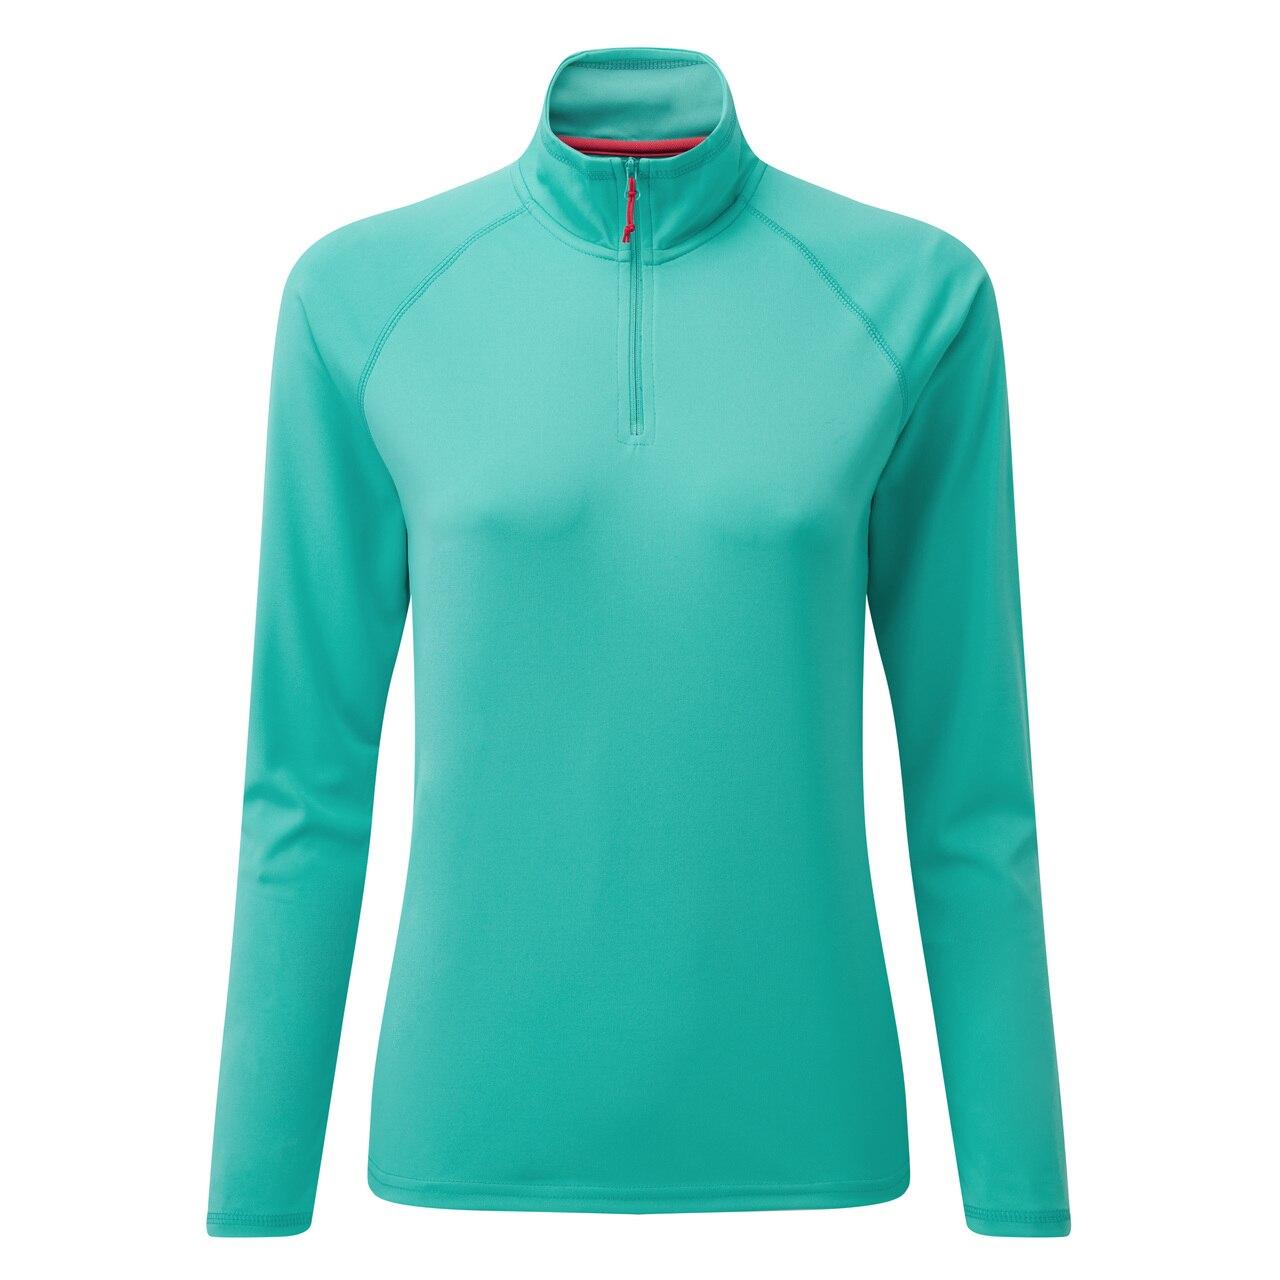 Women's UV Tec Long Sleeve Zip Tee - UV009W-TUR02-1.jpg